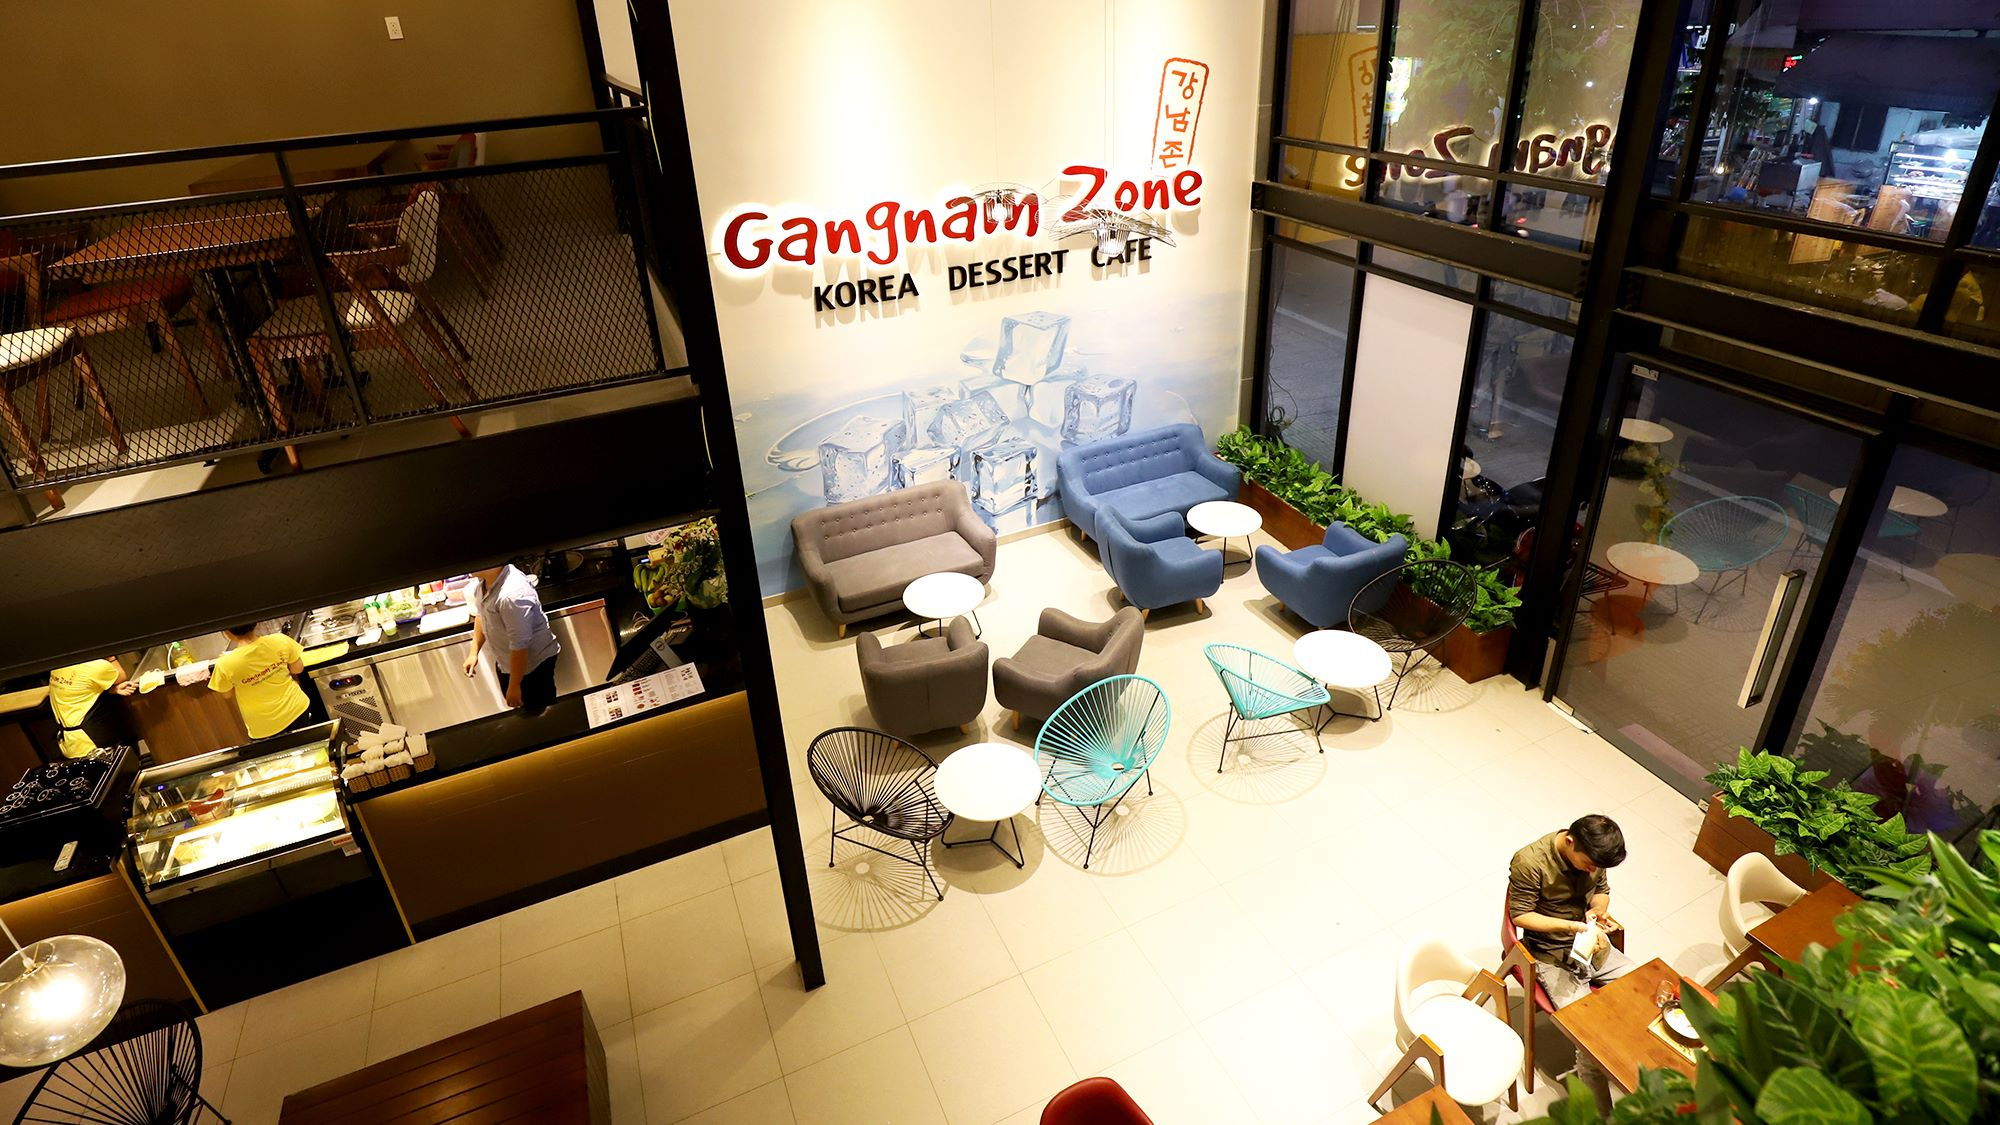 Gangnam Zone